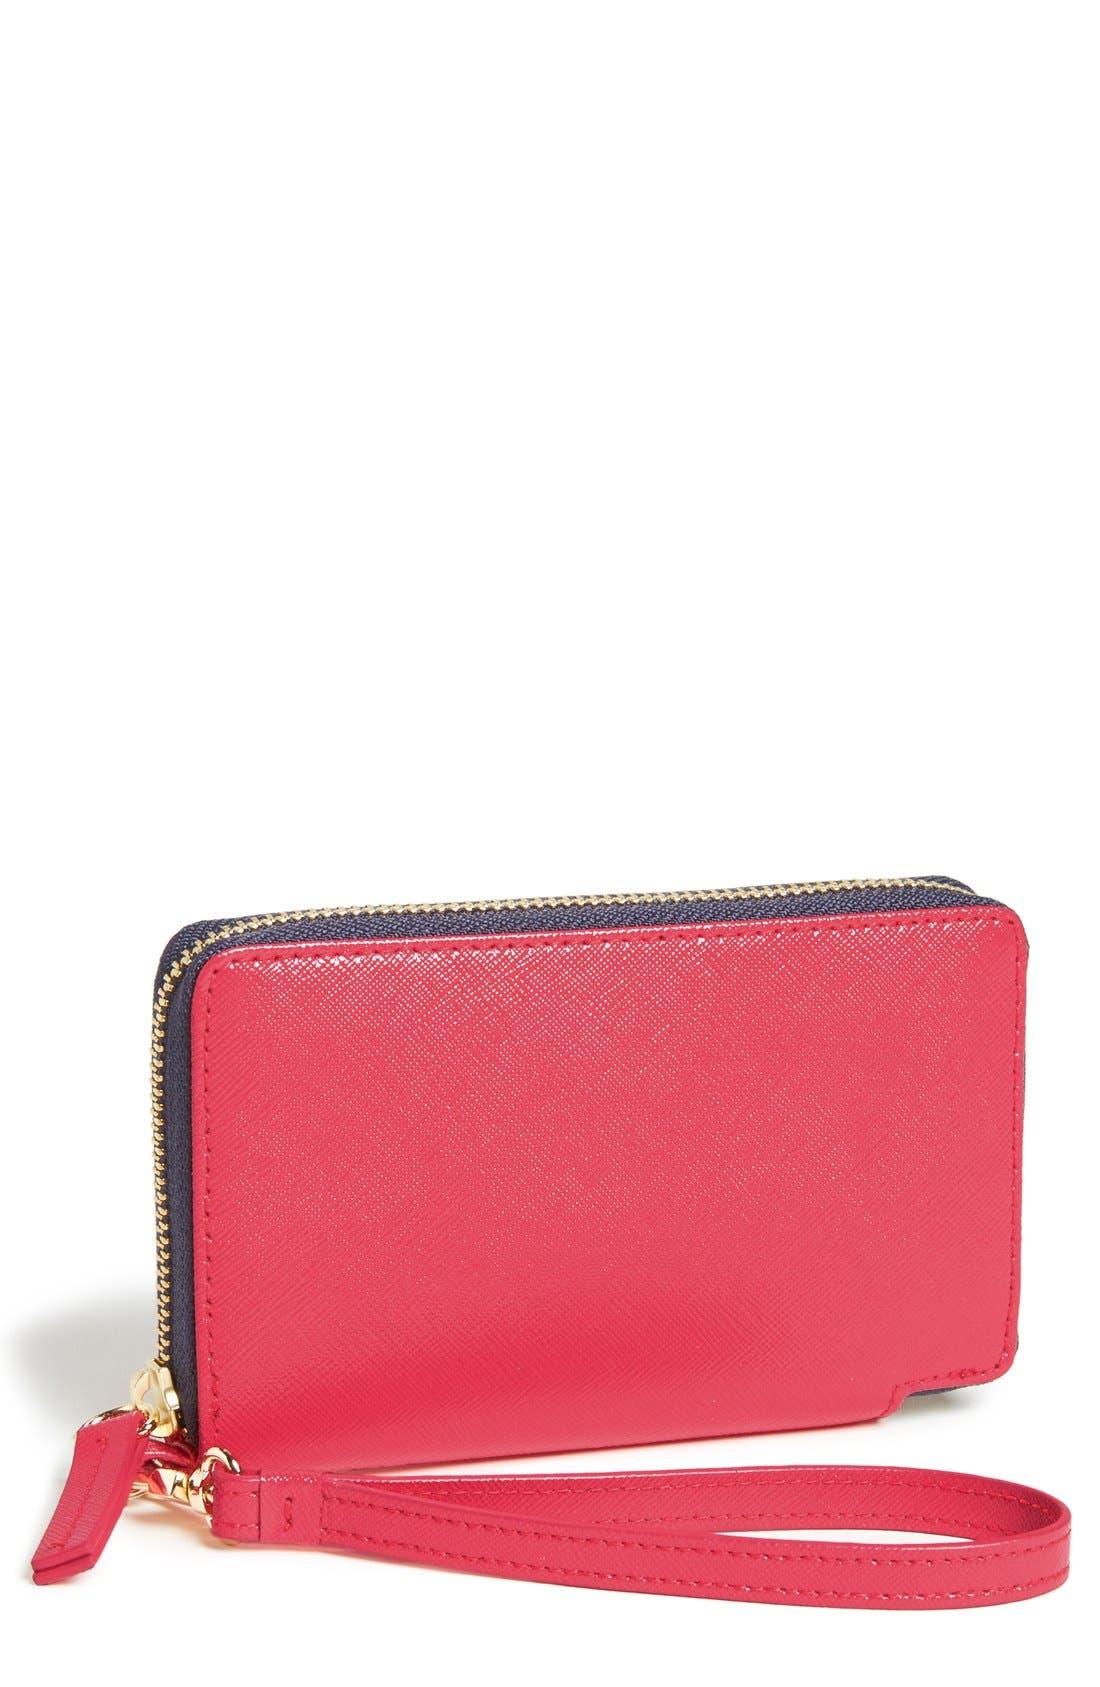 Main Image - Halogen® 'Cassie' Saffiano Leather Phone Wallet